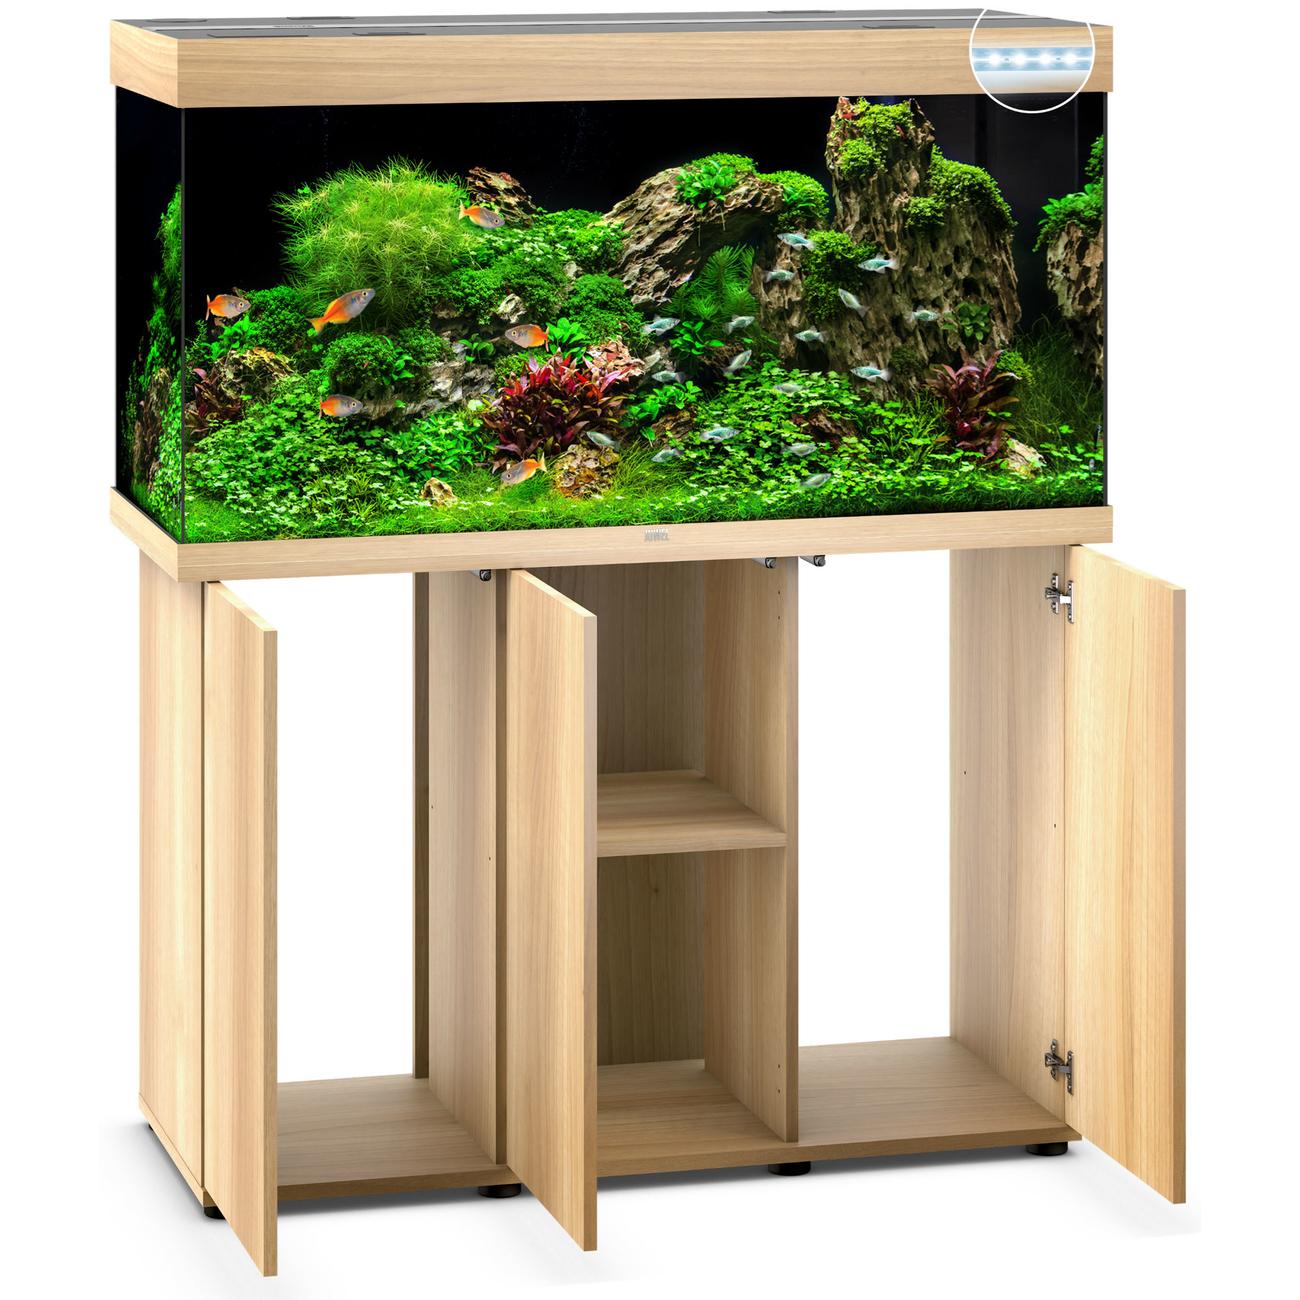 Juwel RIO 350 LED Aquarium mit Unterschrank, Bild 2